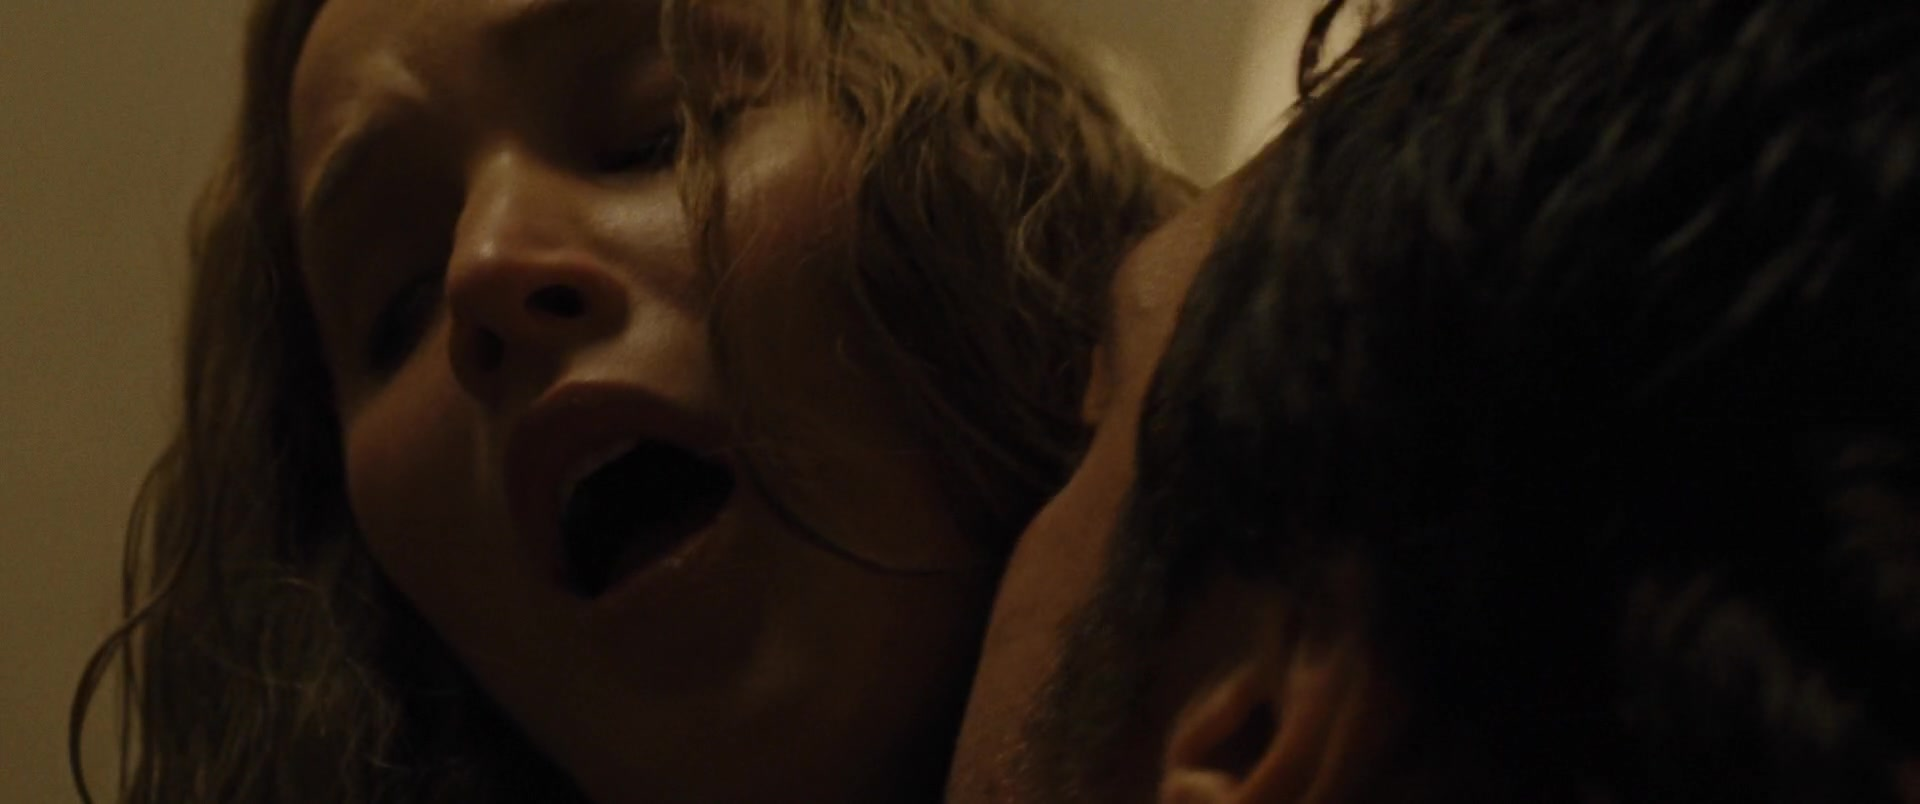 Jennifer-Lawrence-Michelle-Pfeiffer-Mother-28-thefappeningblog.com_.jpg